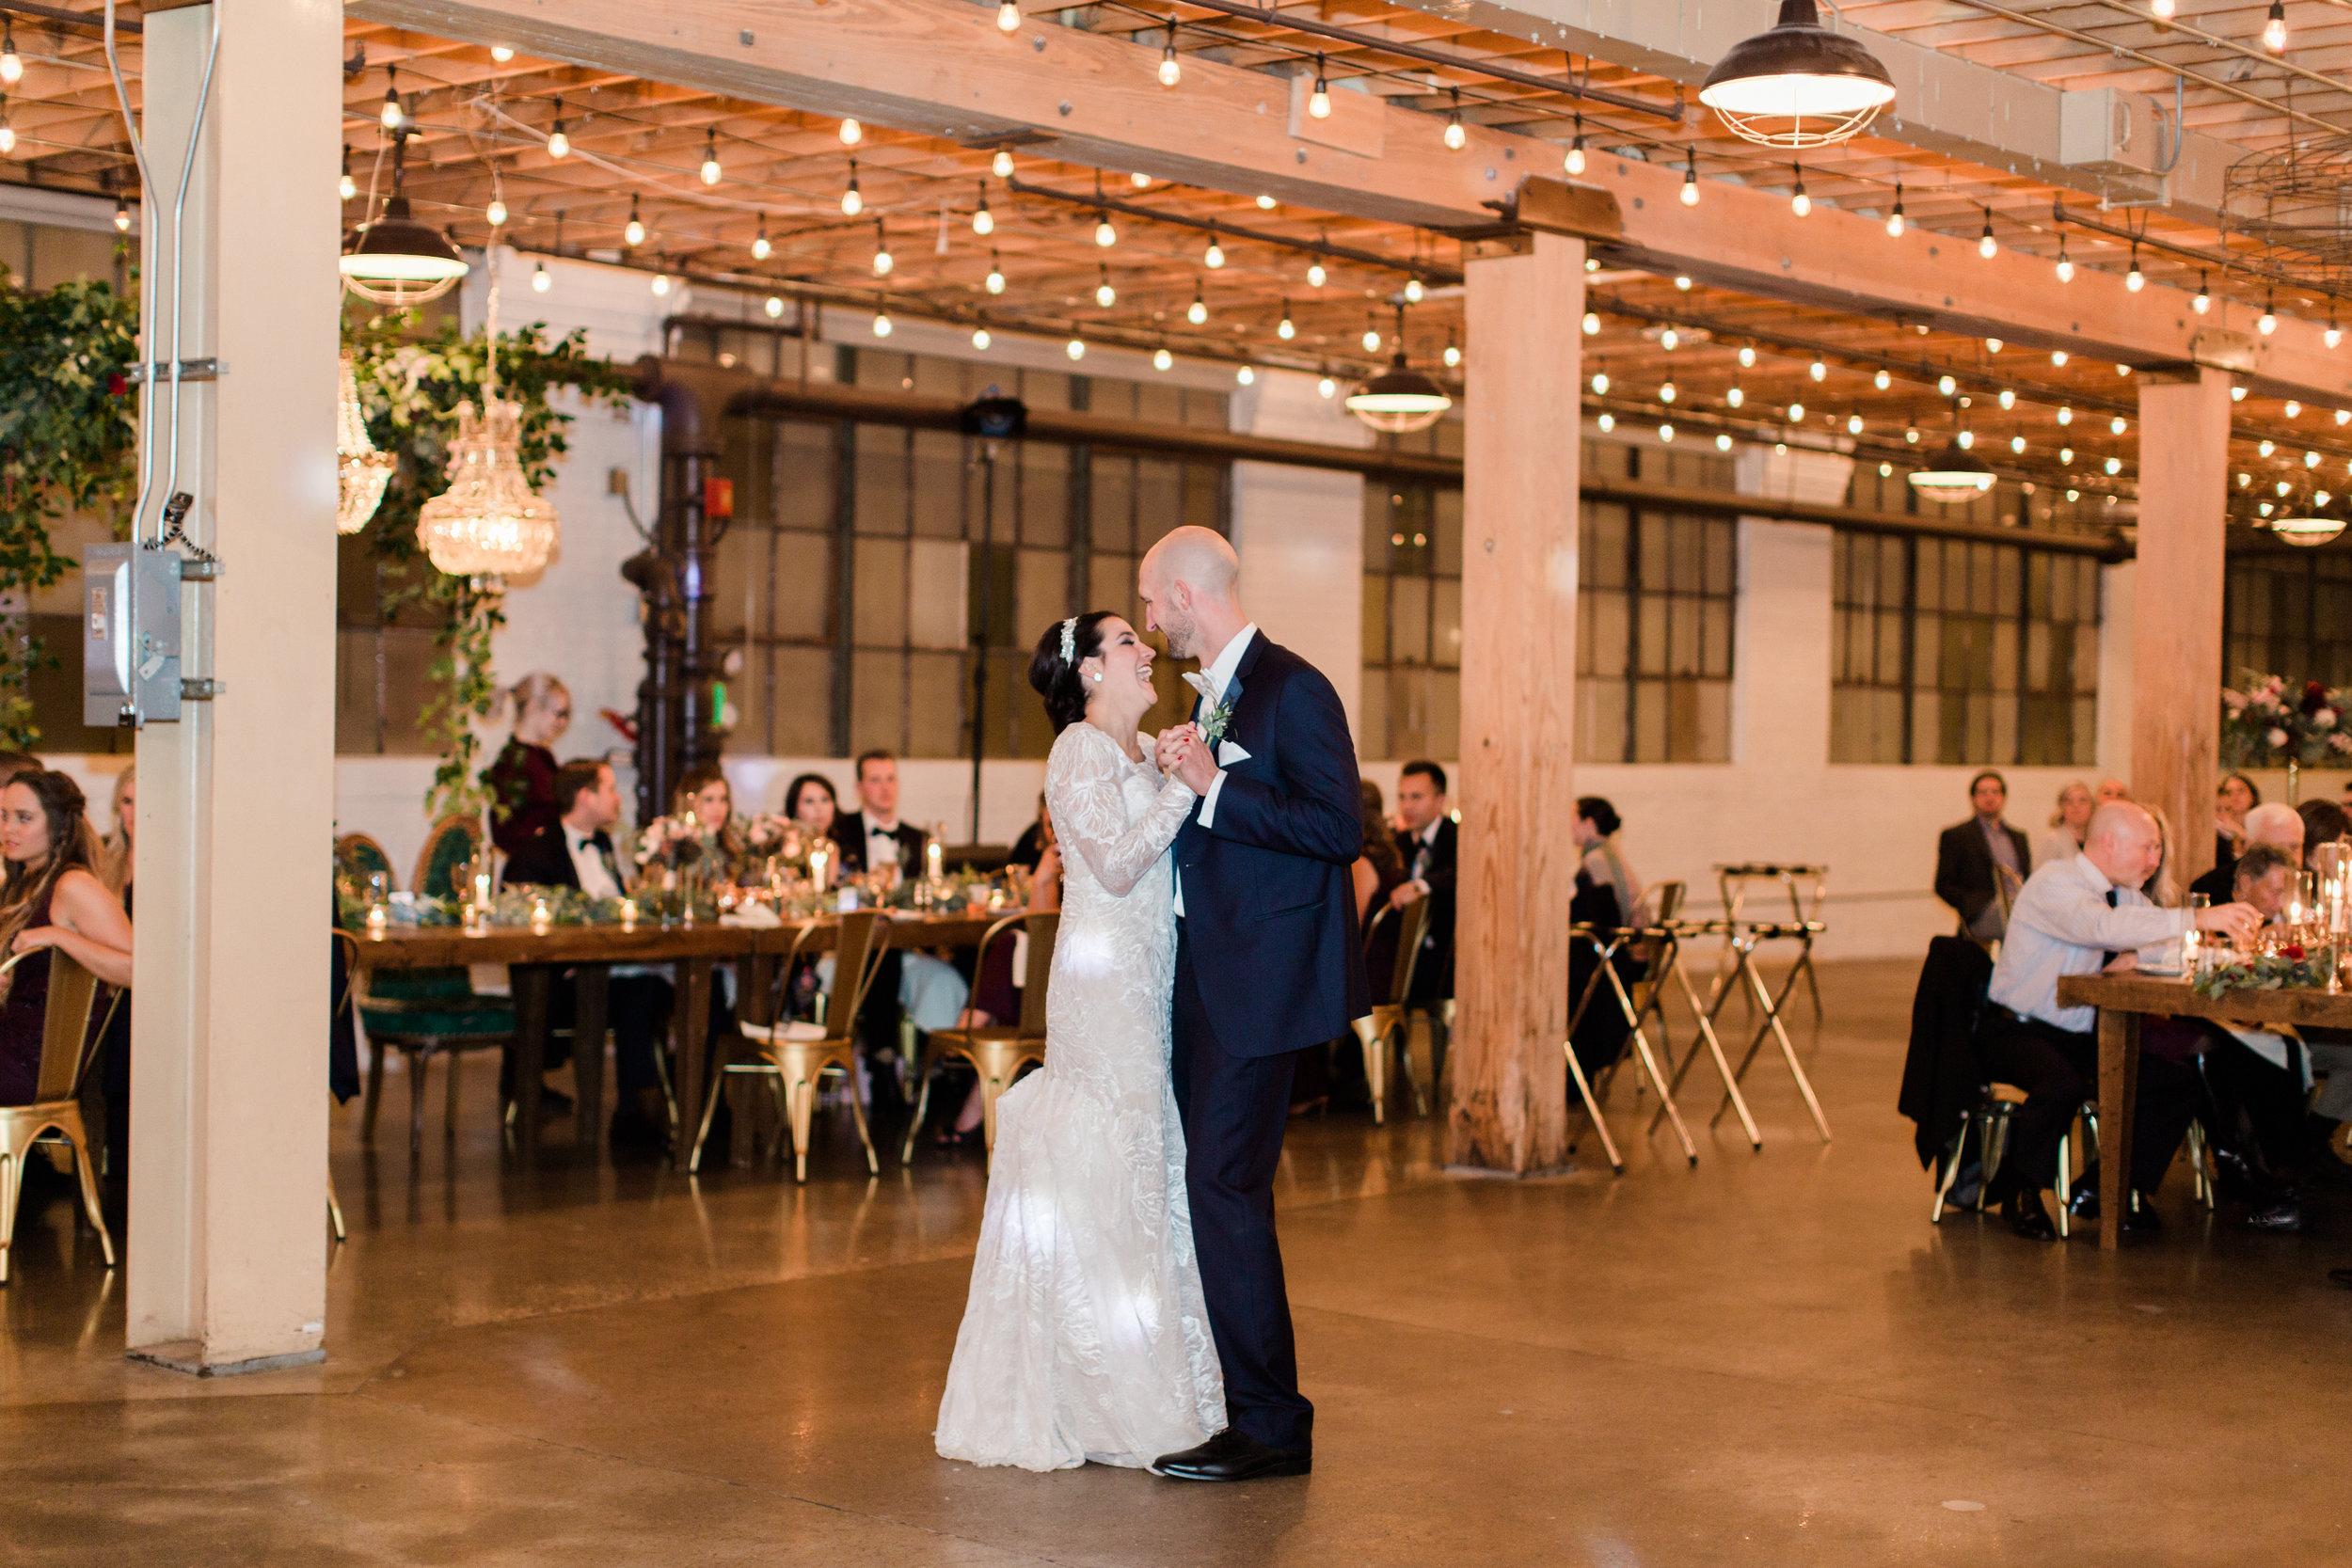 Vogelzang+Wedding+Reception+Dancing-14.jpg